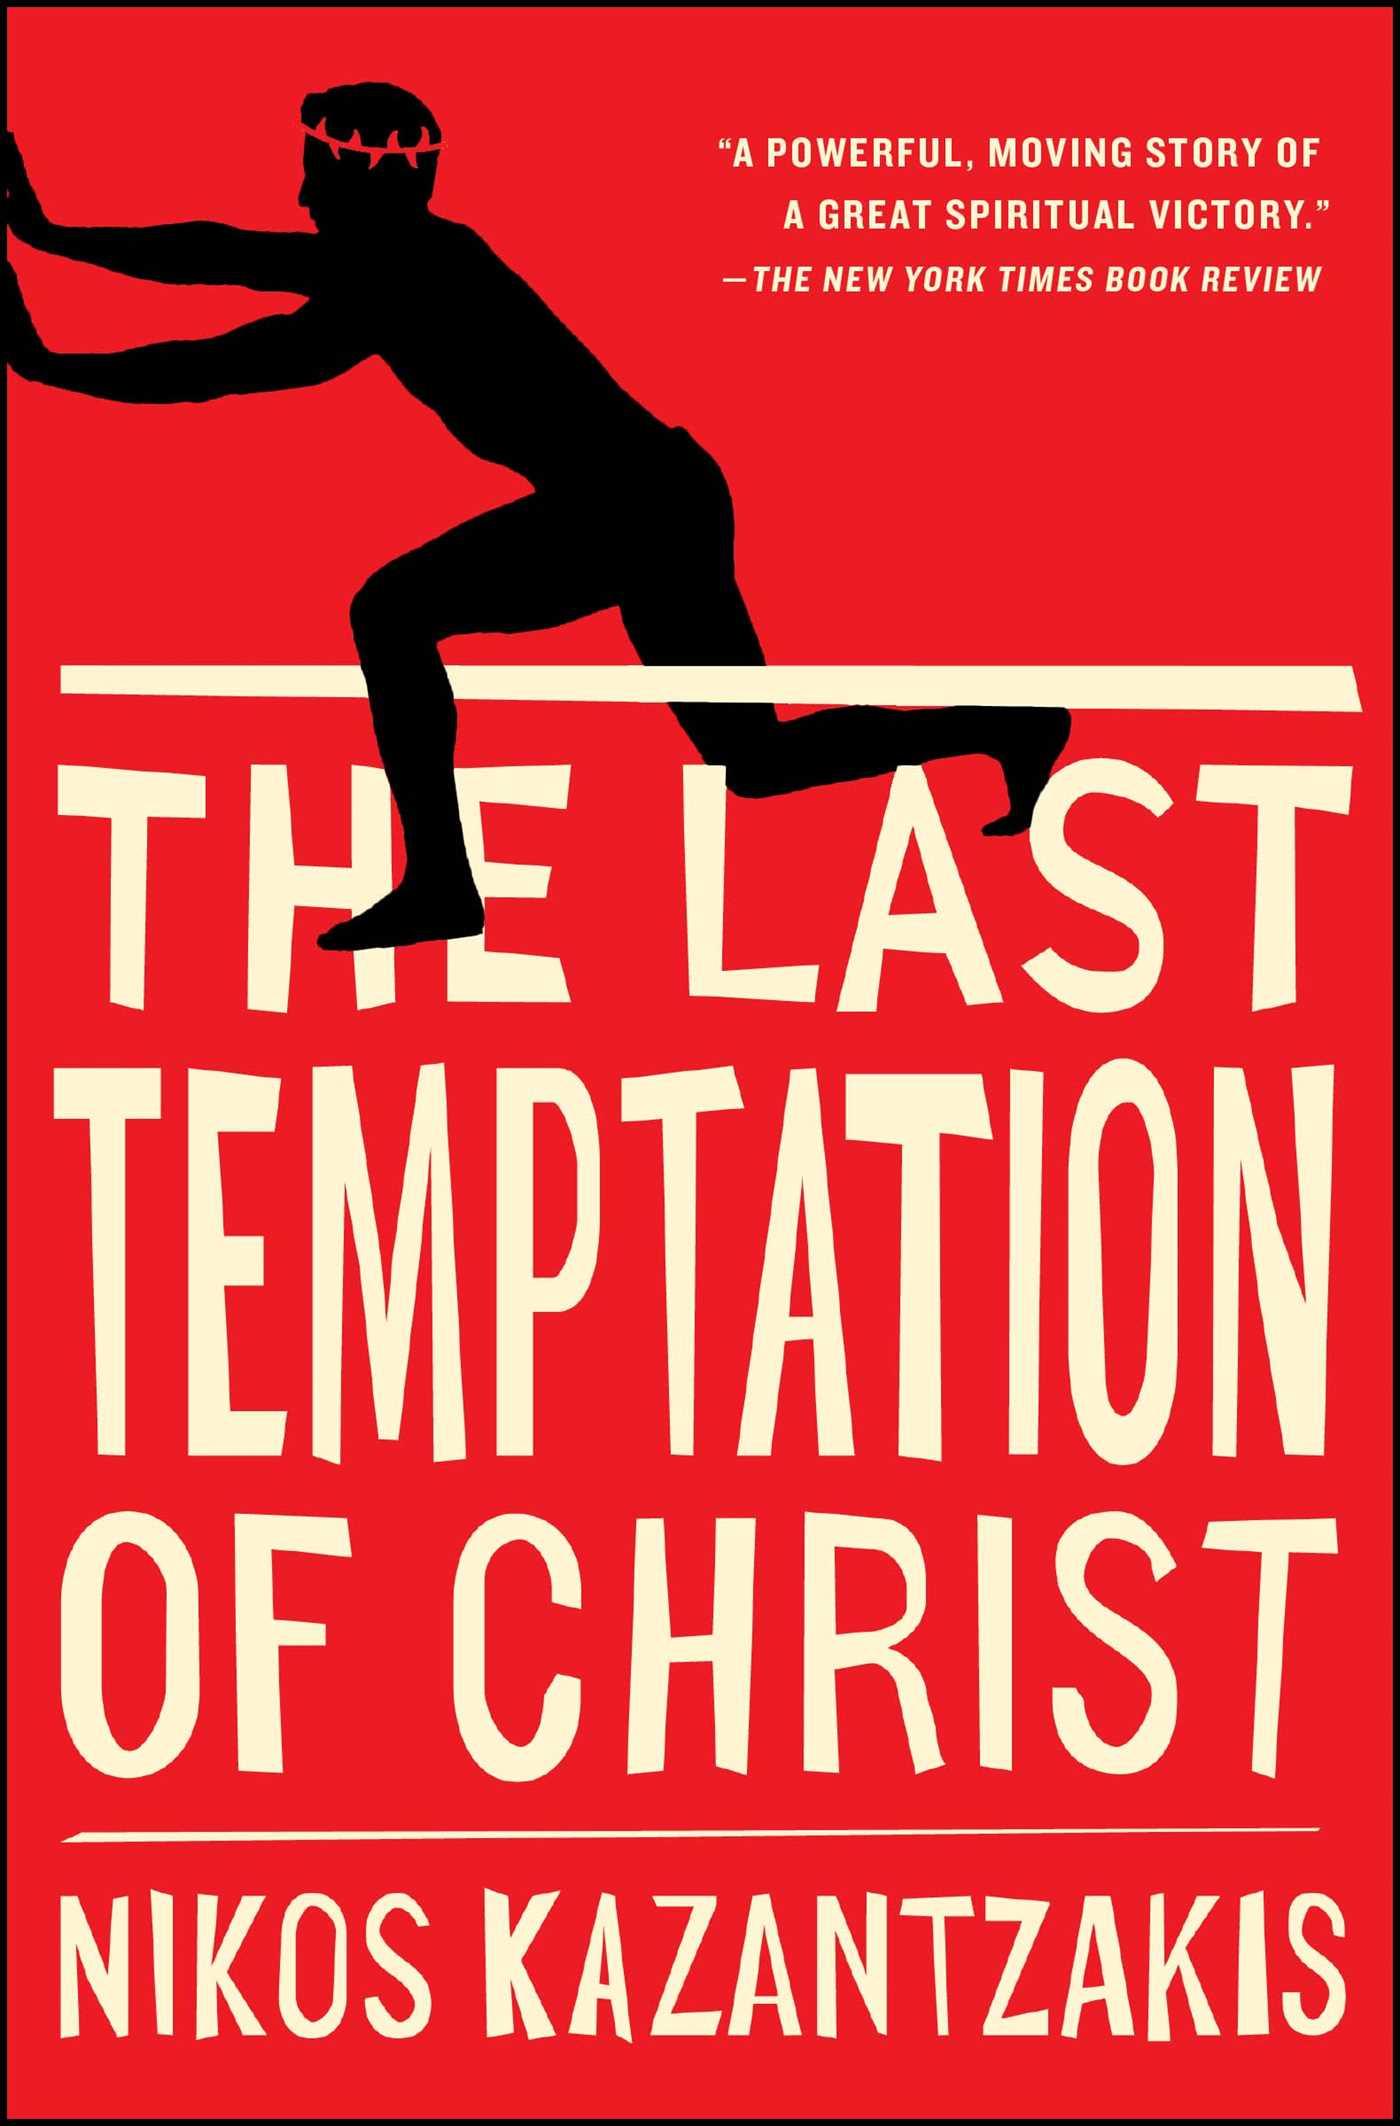 The last temptation of christ 9780684852560 hr